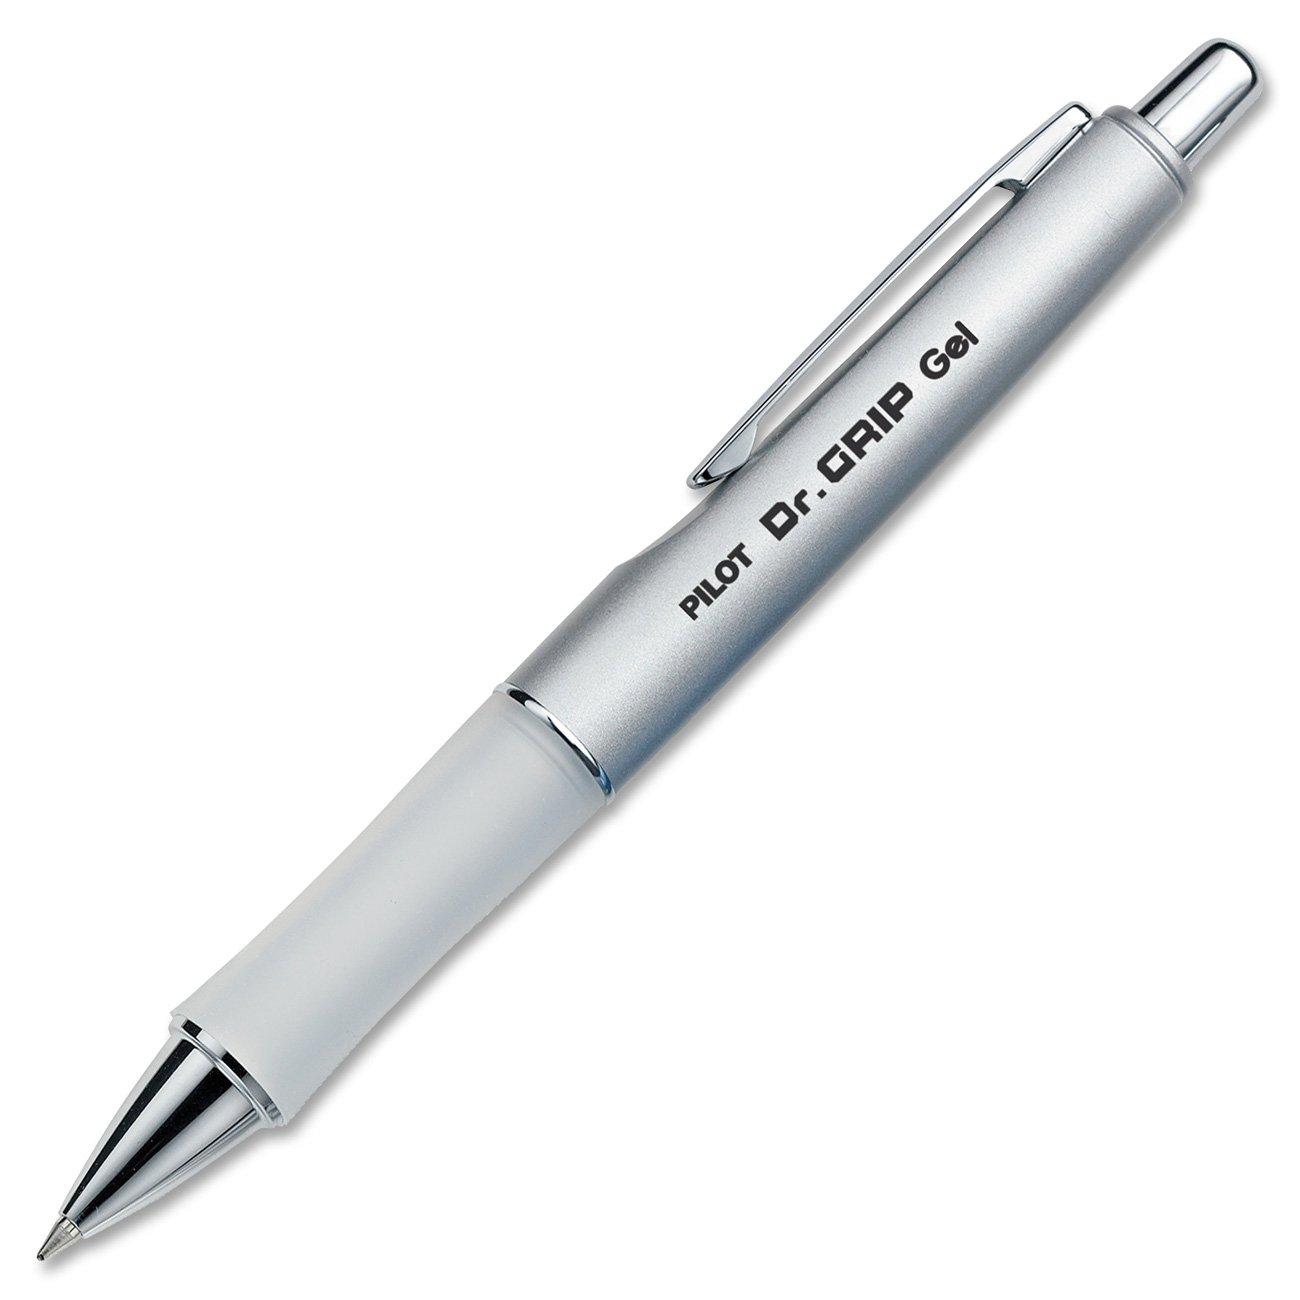 Pilot Dr. Grip Limited Retractable Rolling Ball Gel Pen,...